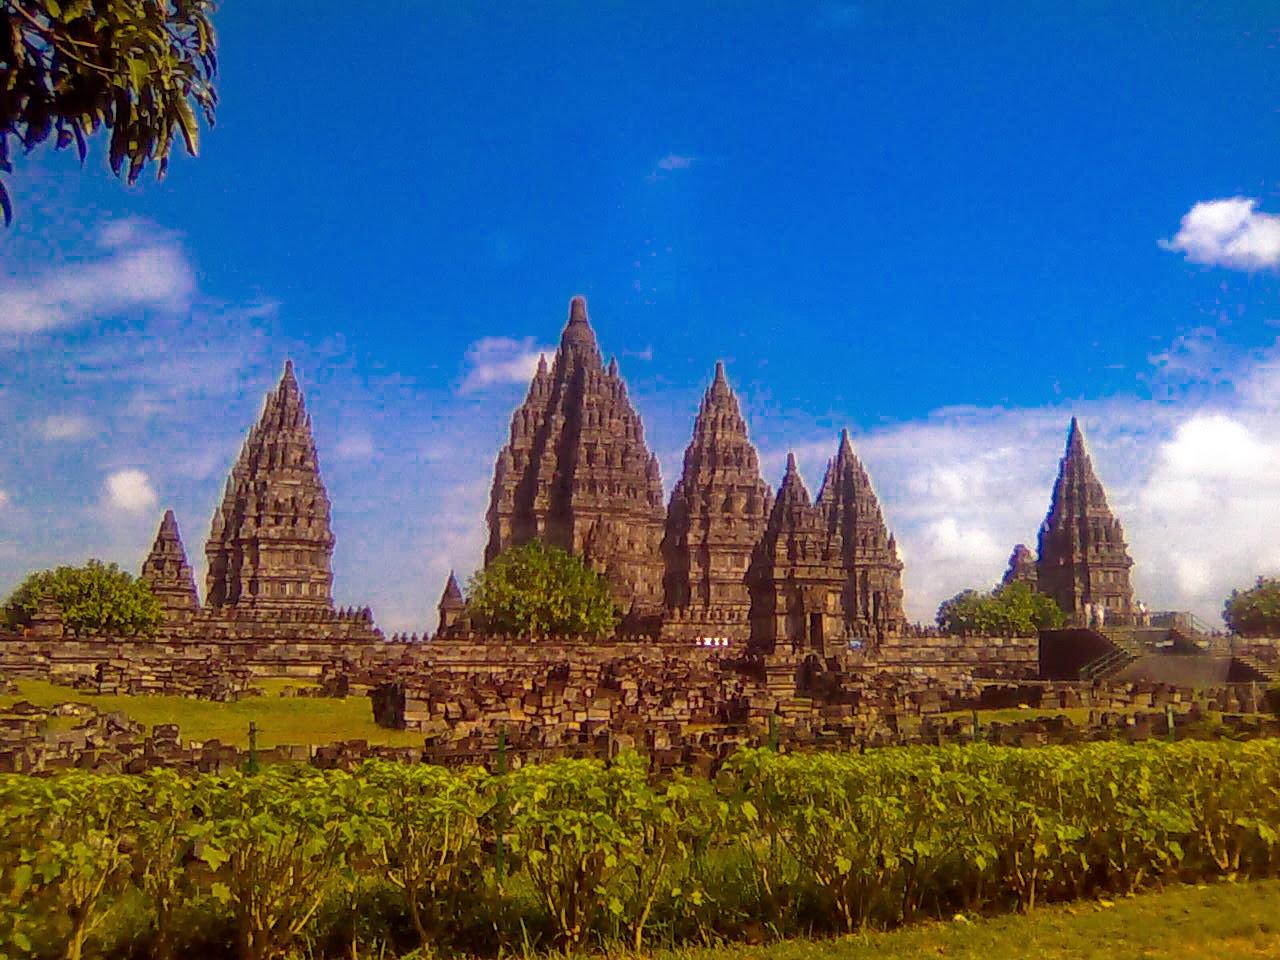 Wisata Candi Prambanan Rencana Sono Sihhh Dibangun Sekitar 850 Masehi